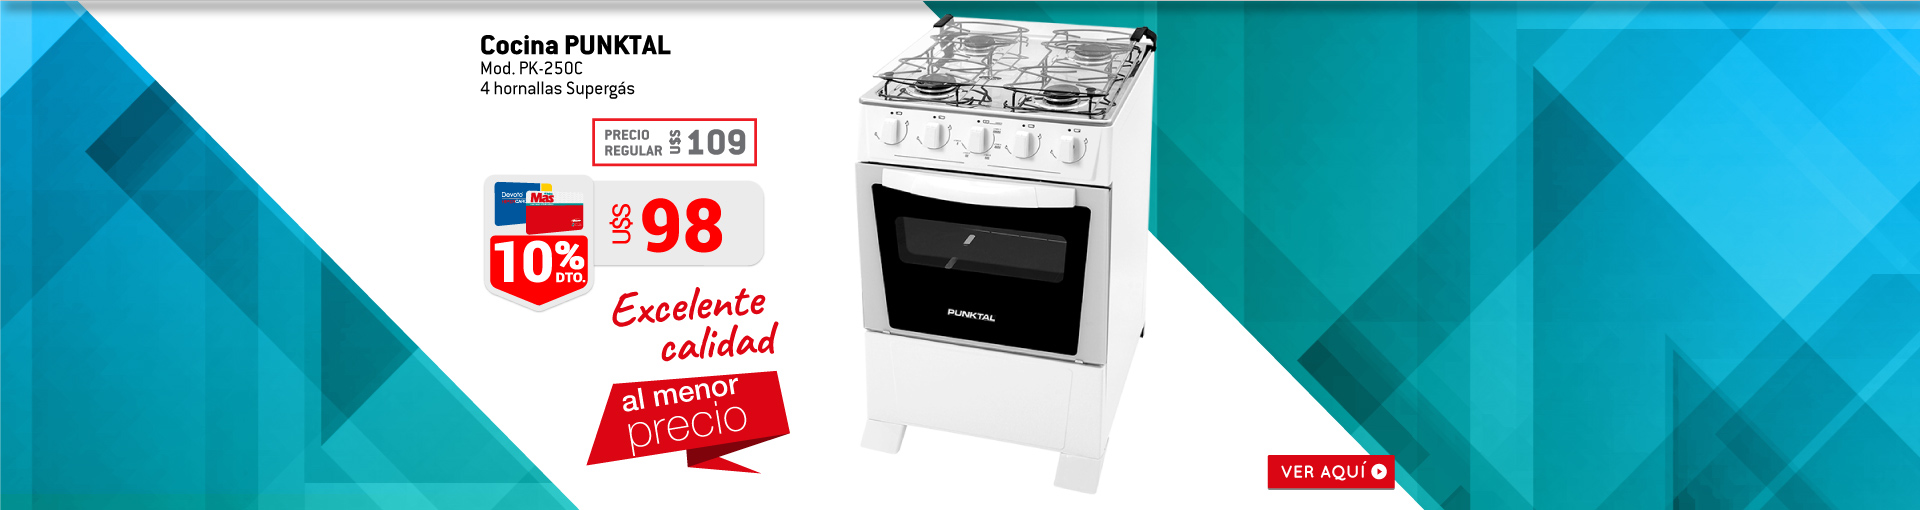 h-01-375892-cocina-punktal-pk-250c